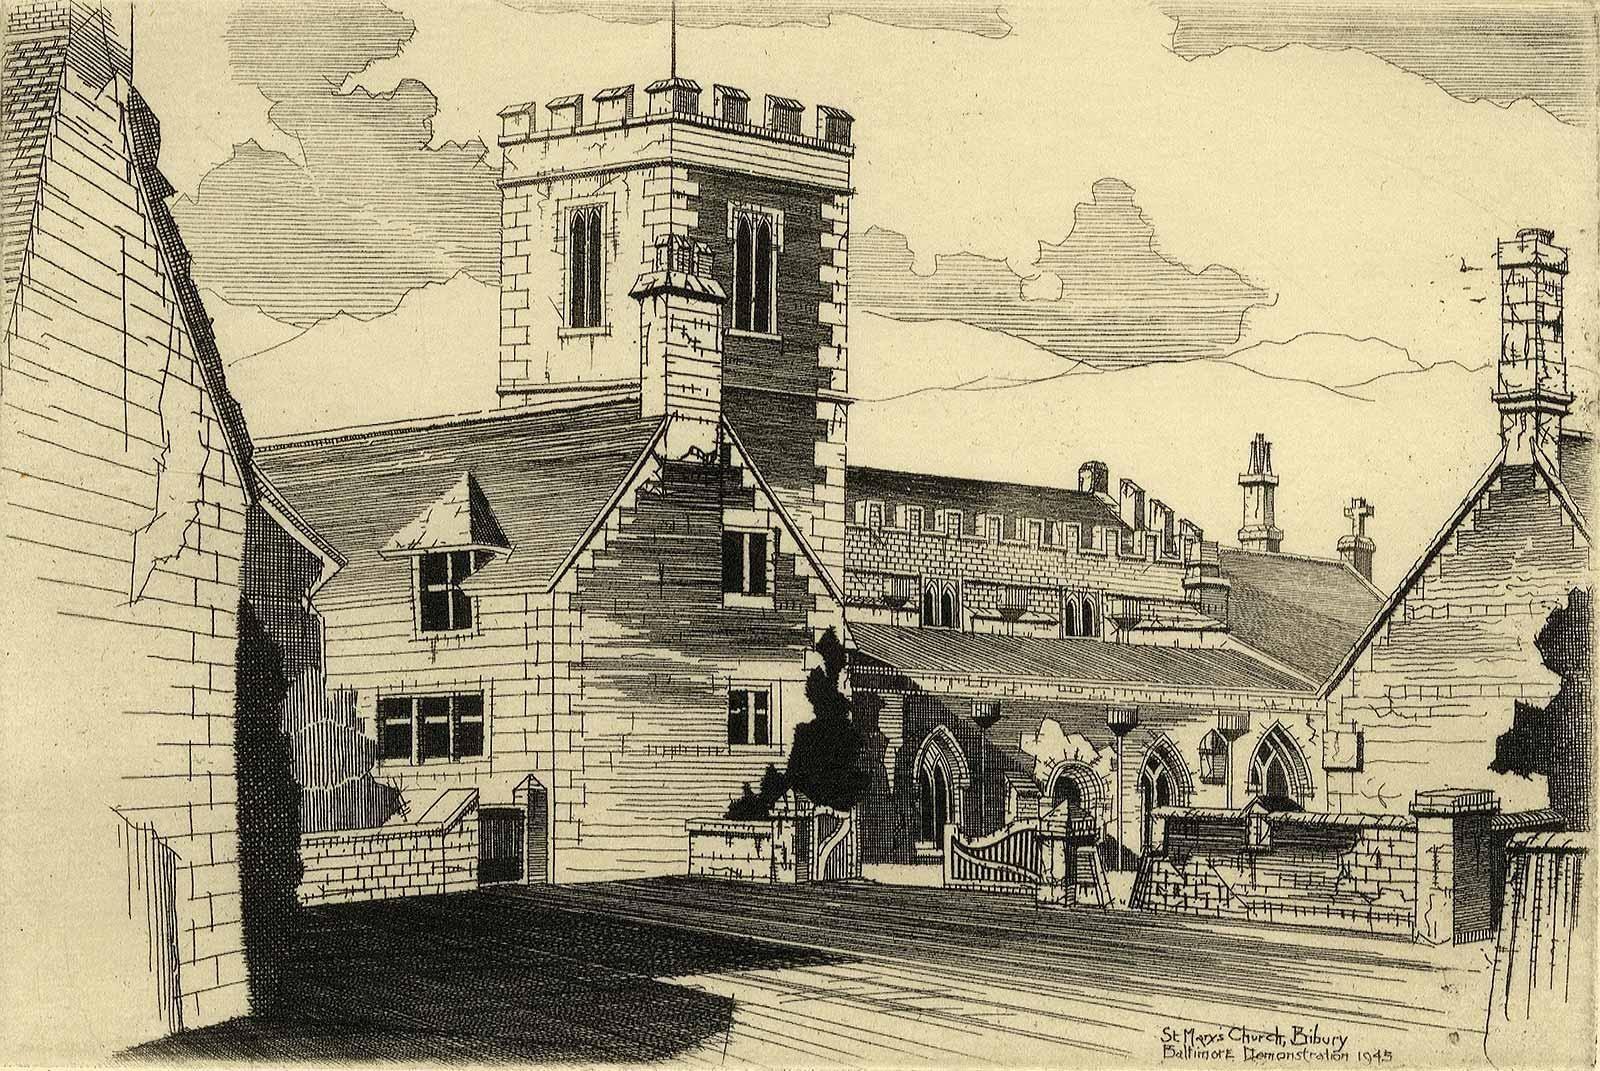 St. Mary's Church in Bibury, England